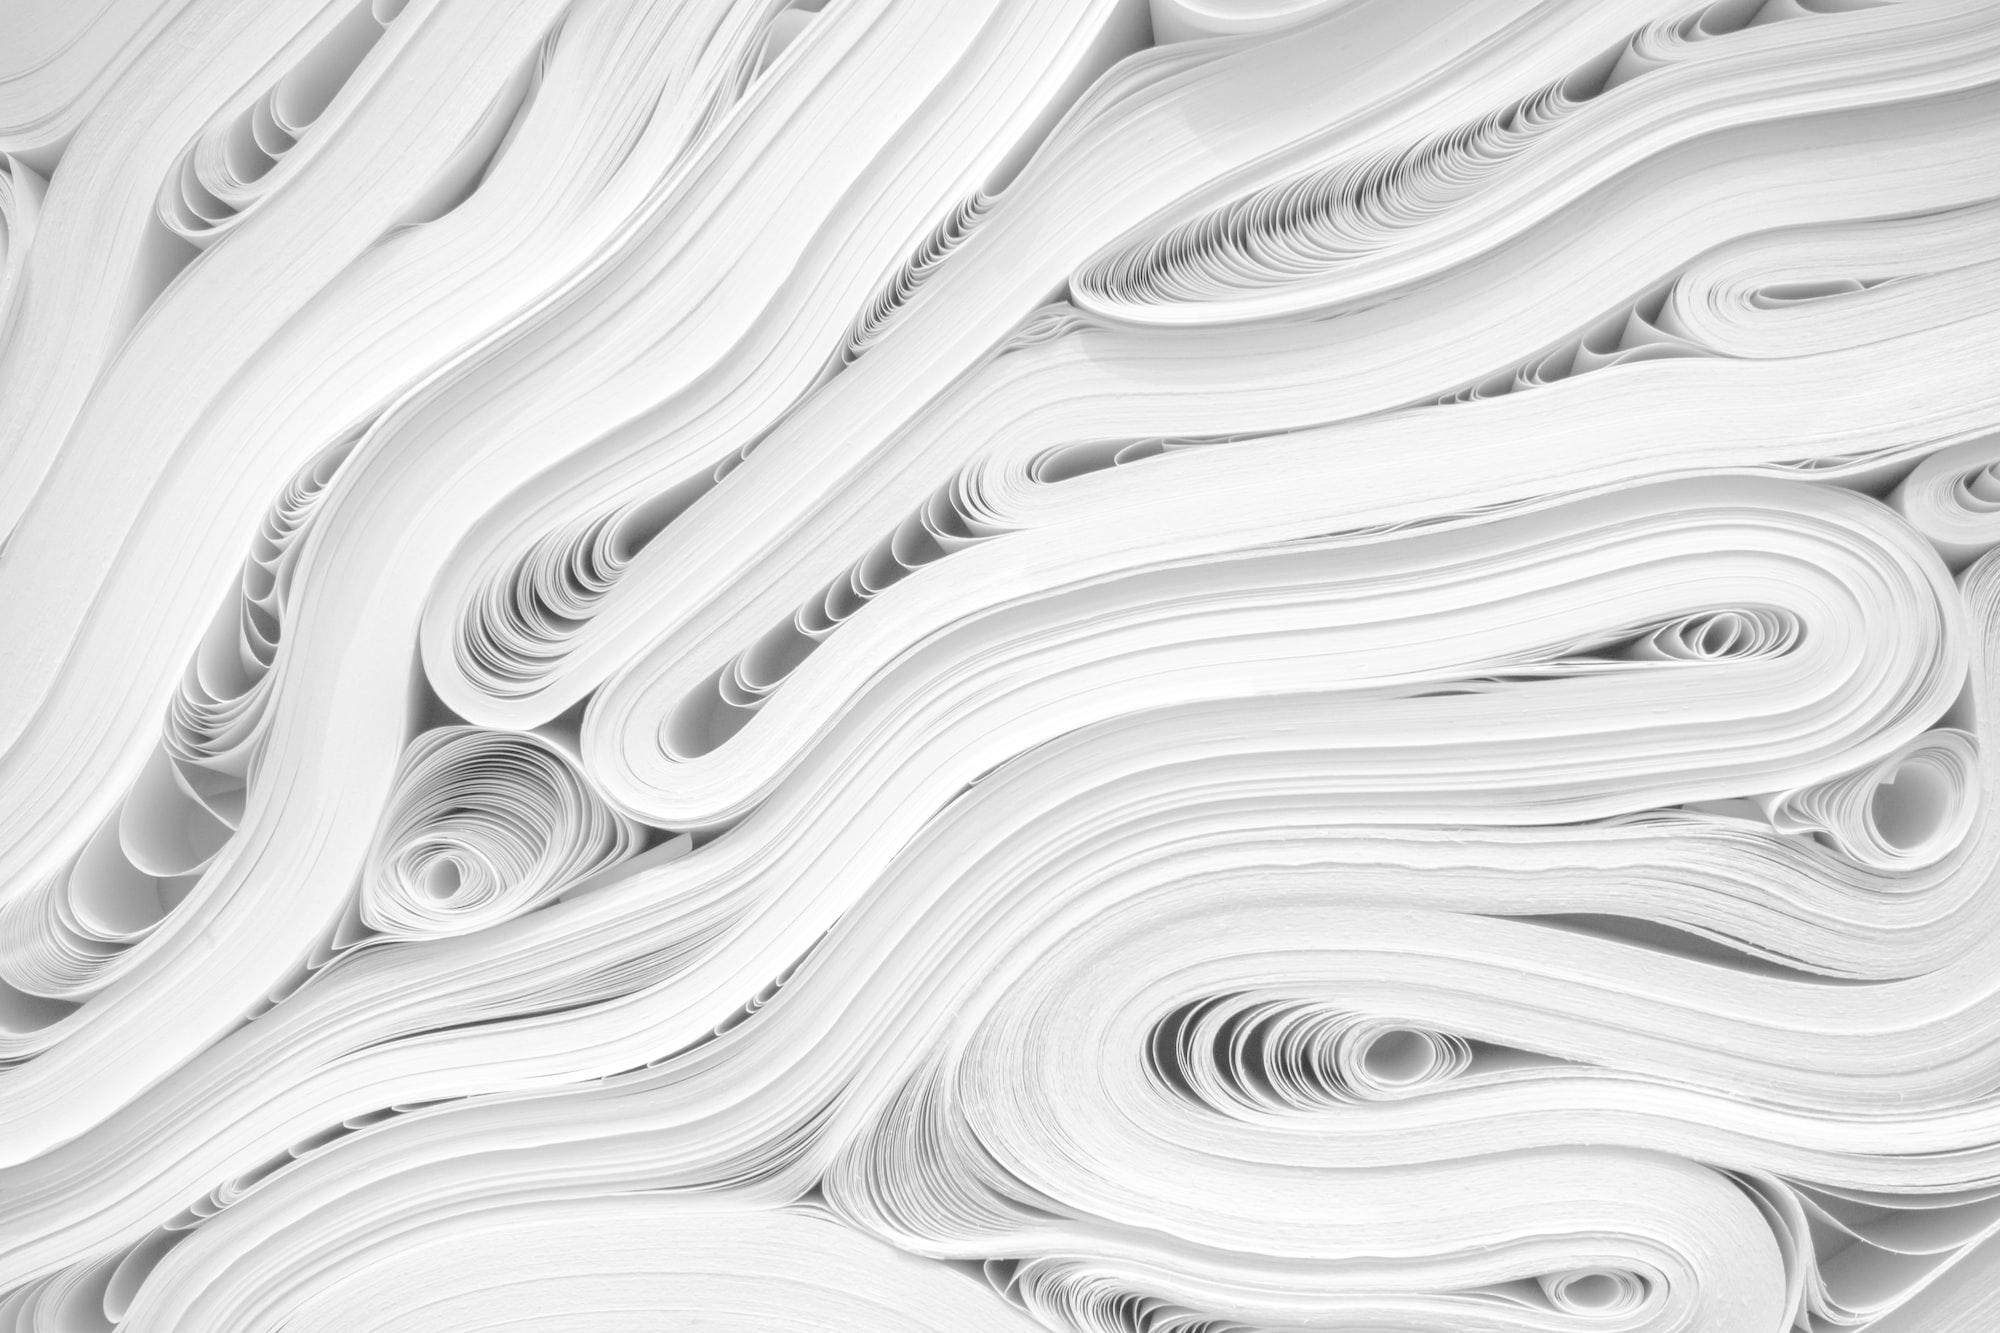 Reams of white paper in swirls.